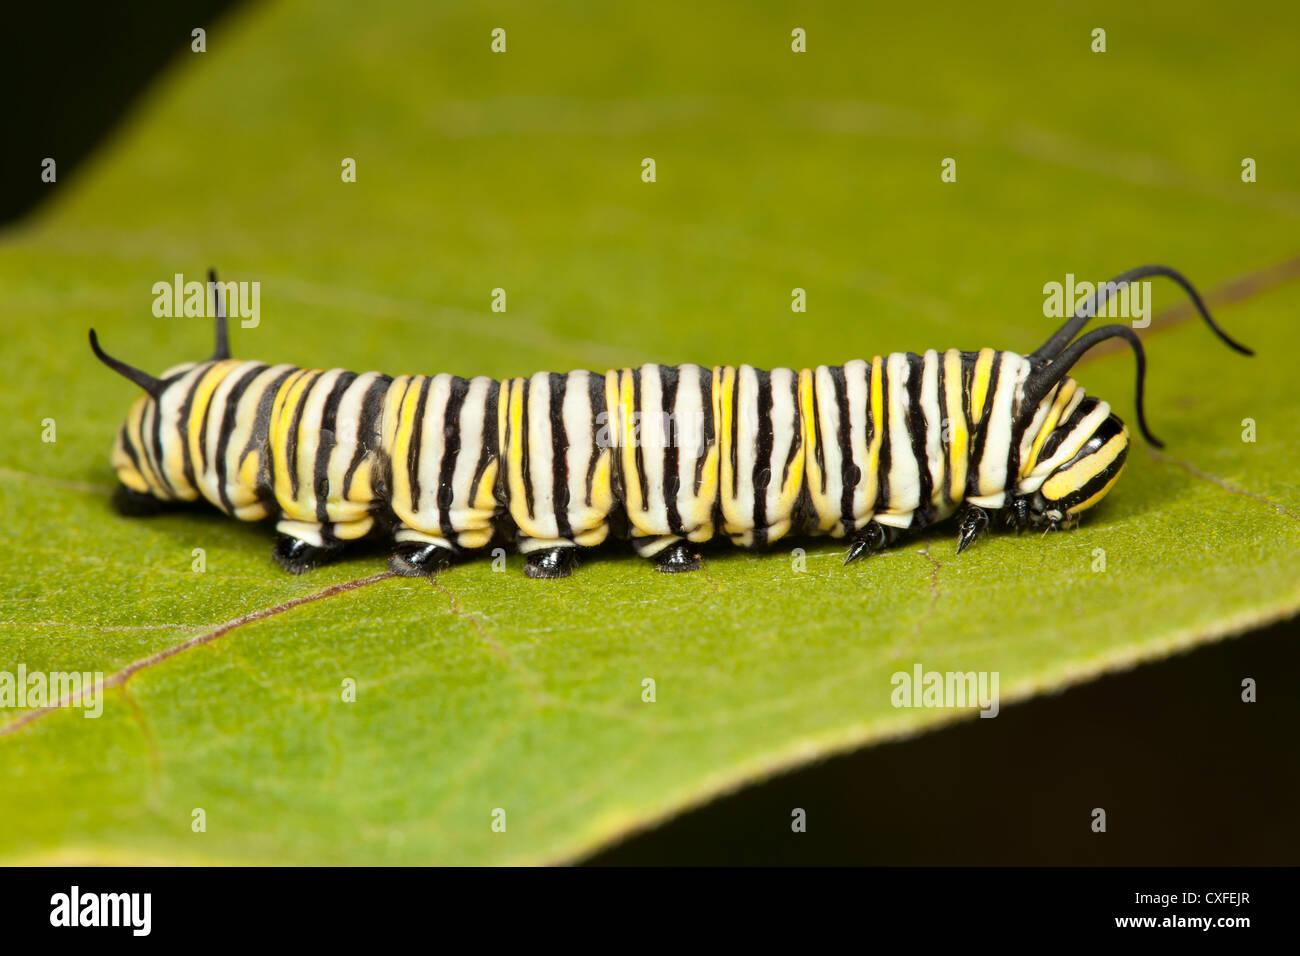 Monarch Butterfly (Danaus Plexippus) caterpillar (larva) 5th instar on a Milkweed plant leaf - Stock Image